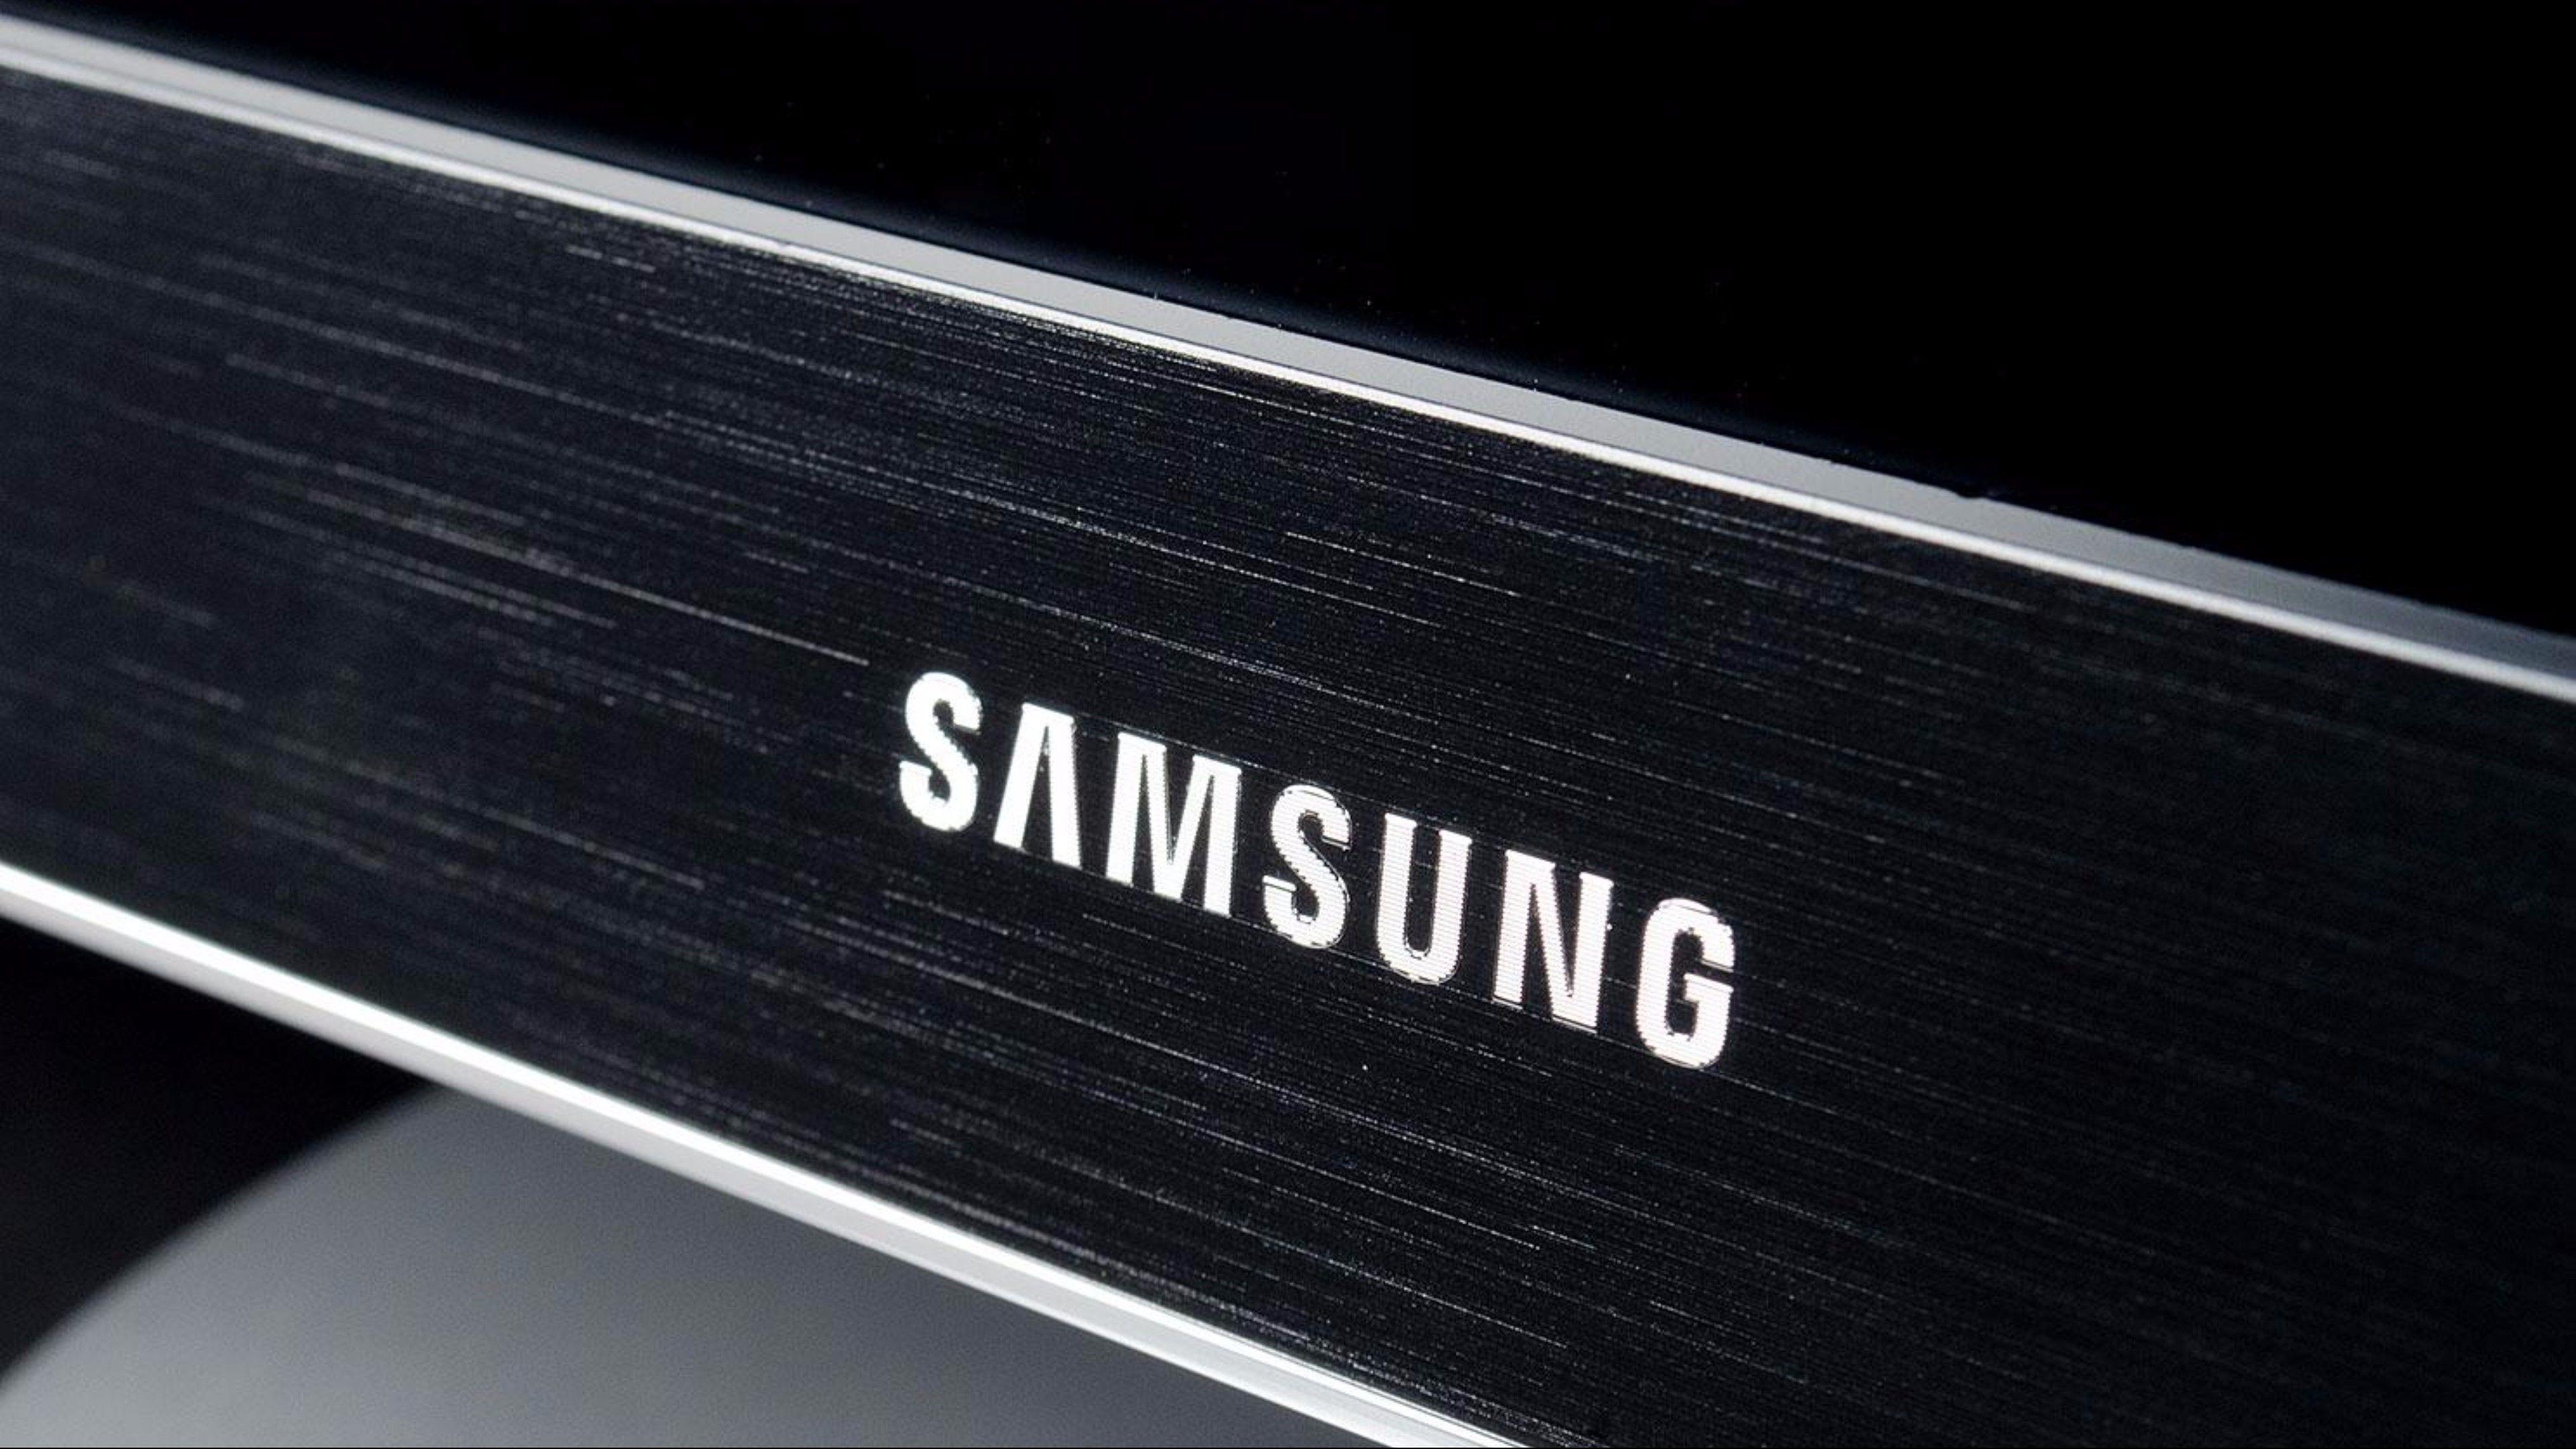 Samsung 4k Logo Wallpapers Top Free Samsung 4k Logo Backgrounds Wallpaperaccess